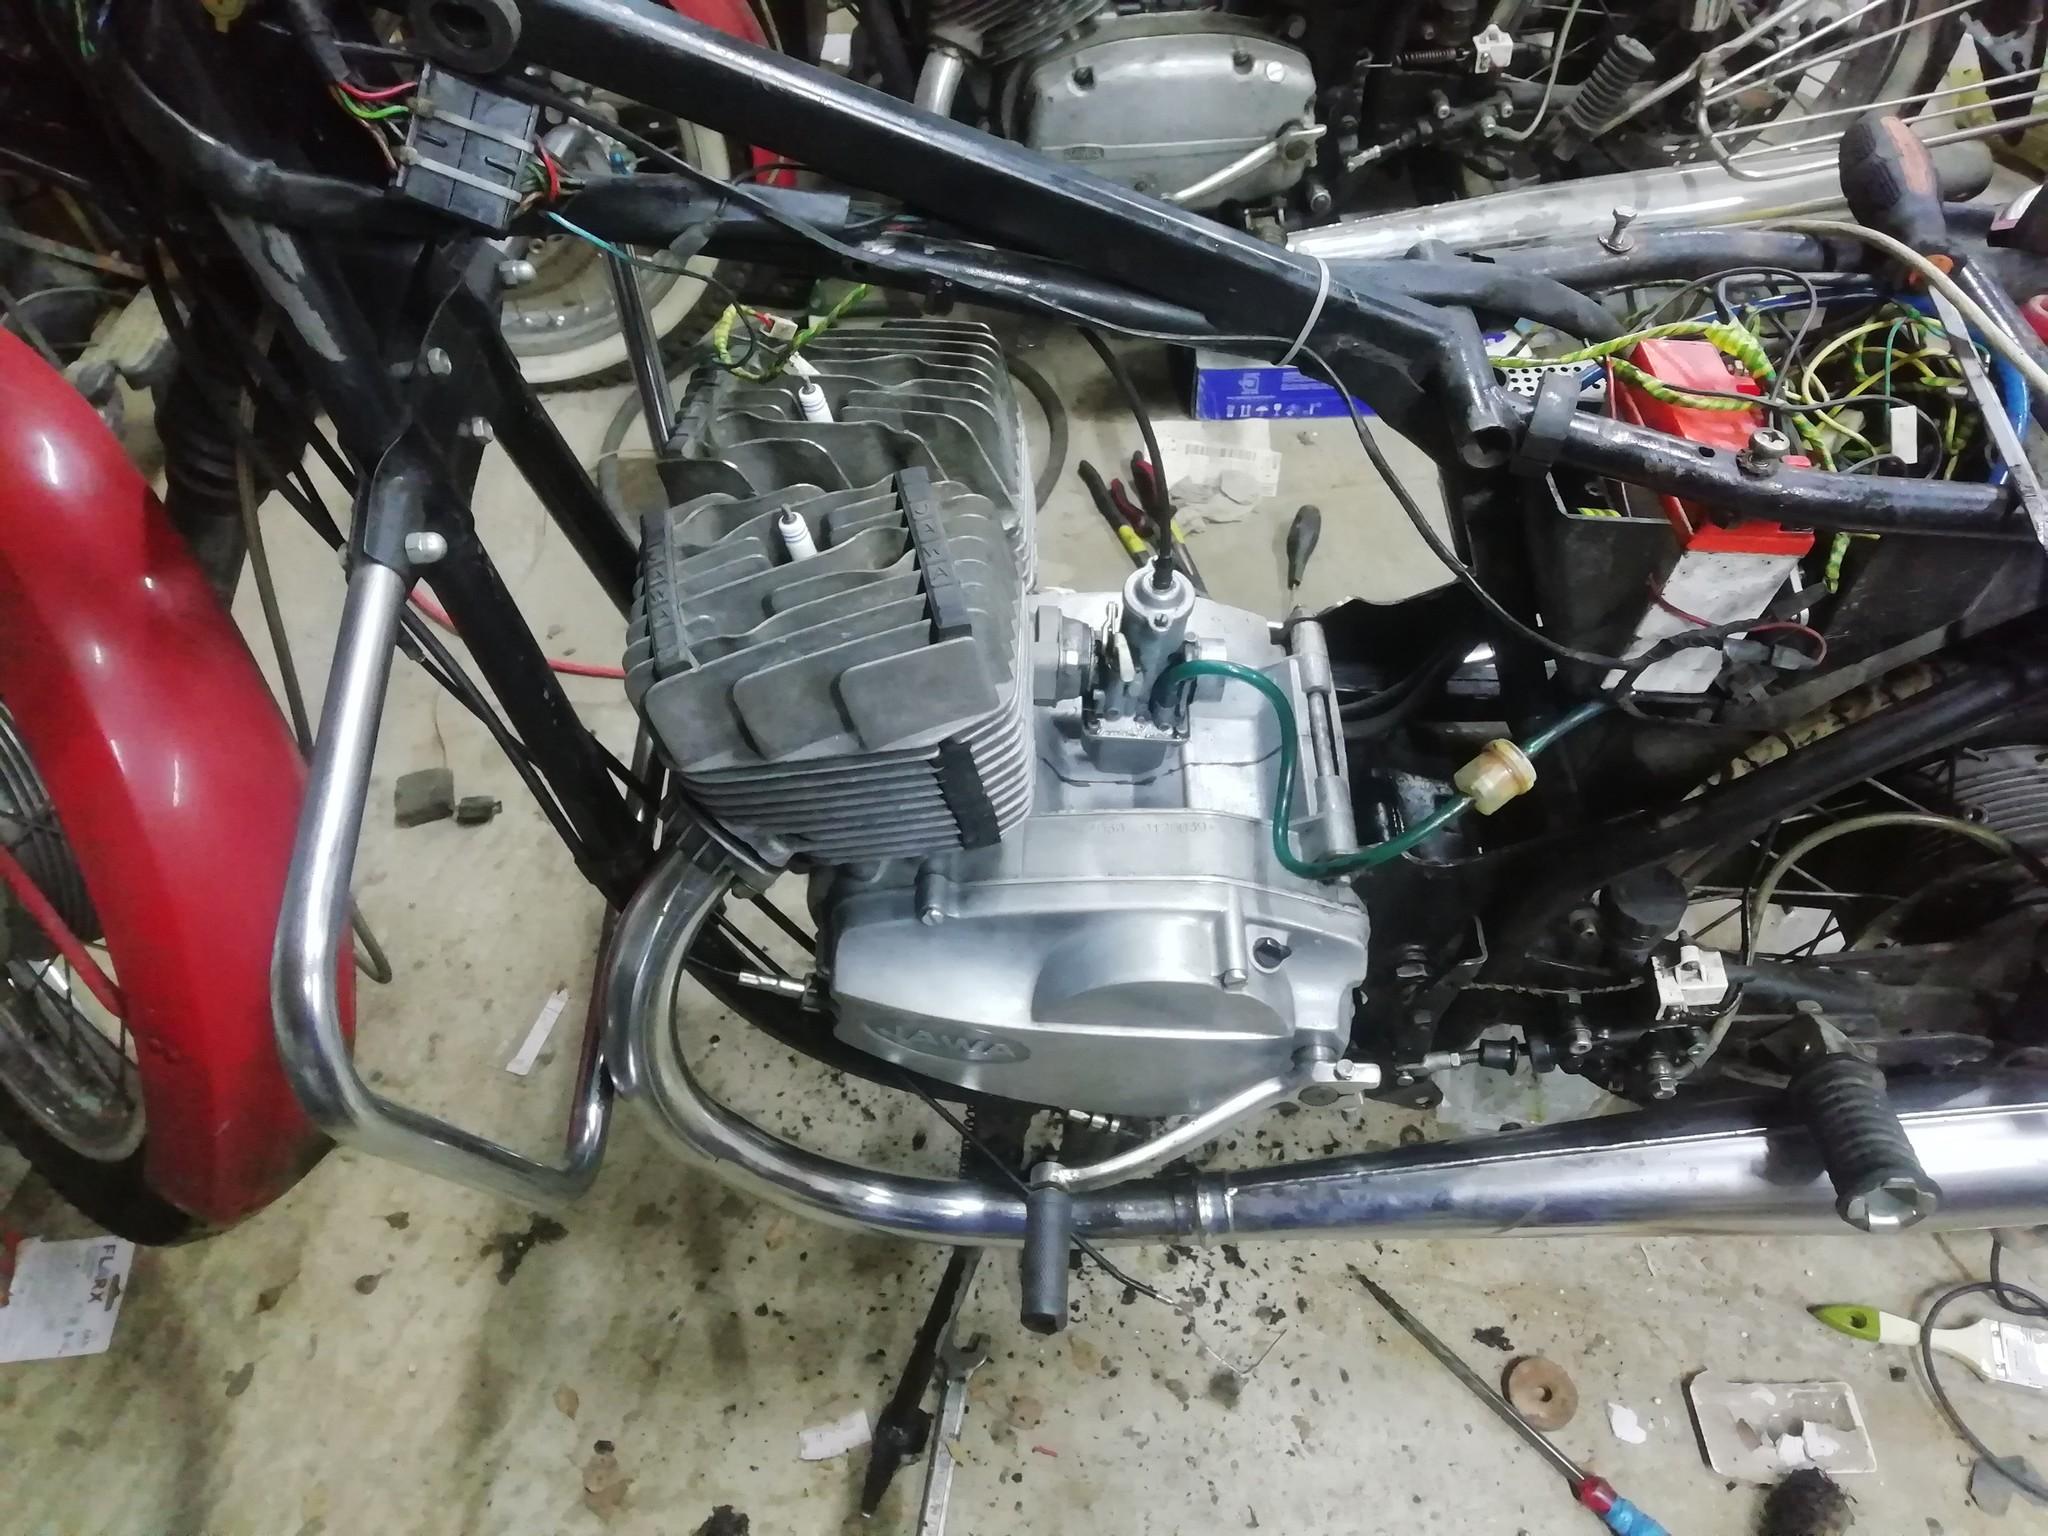 h-3707.jpg